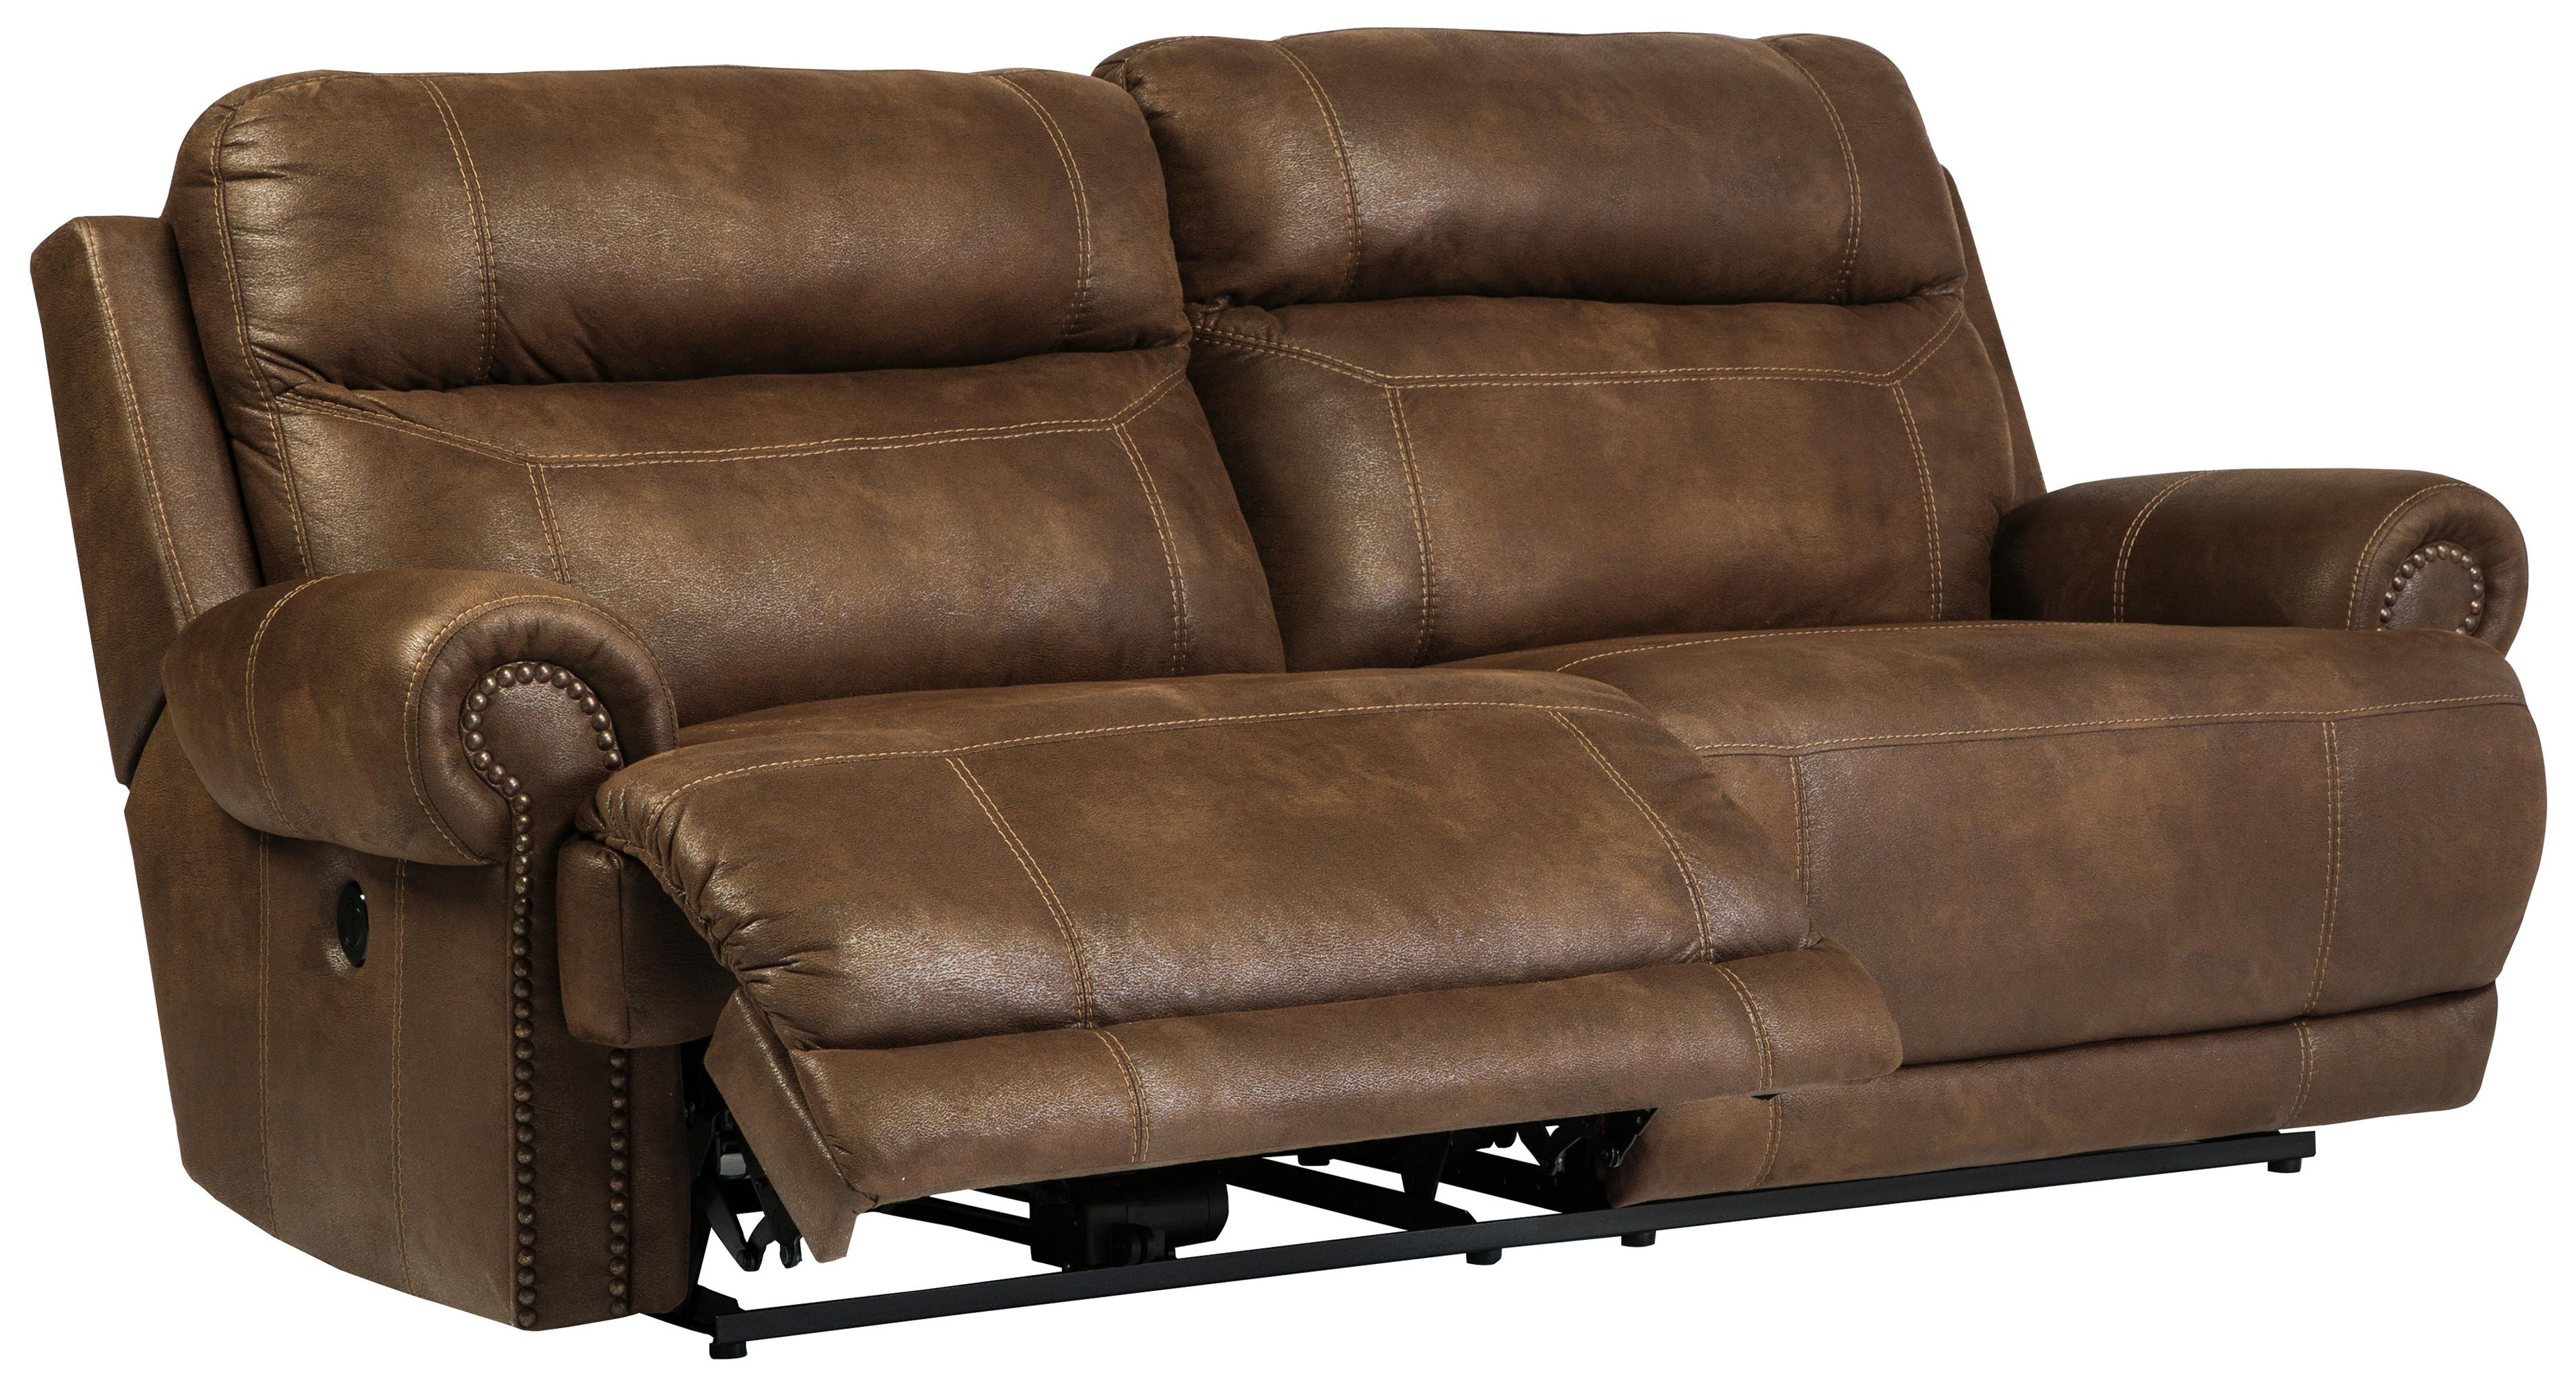 Ashley Signature Design Austere Brown 3840047 2 Seat